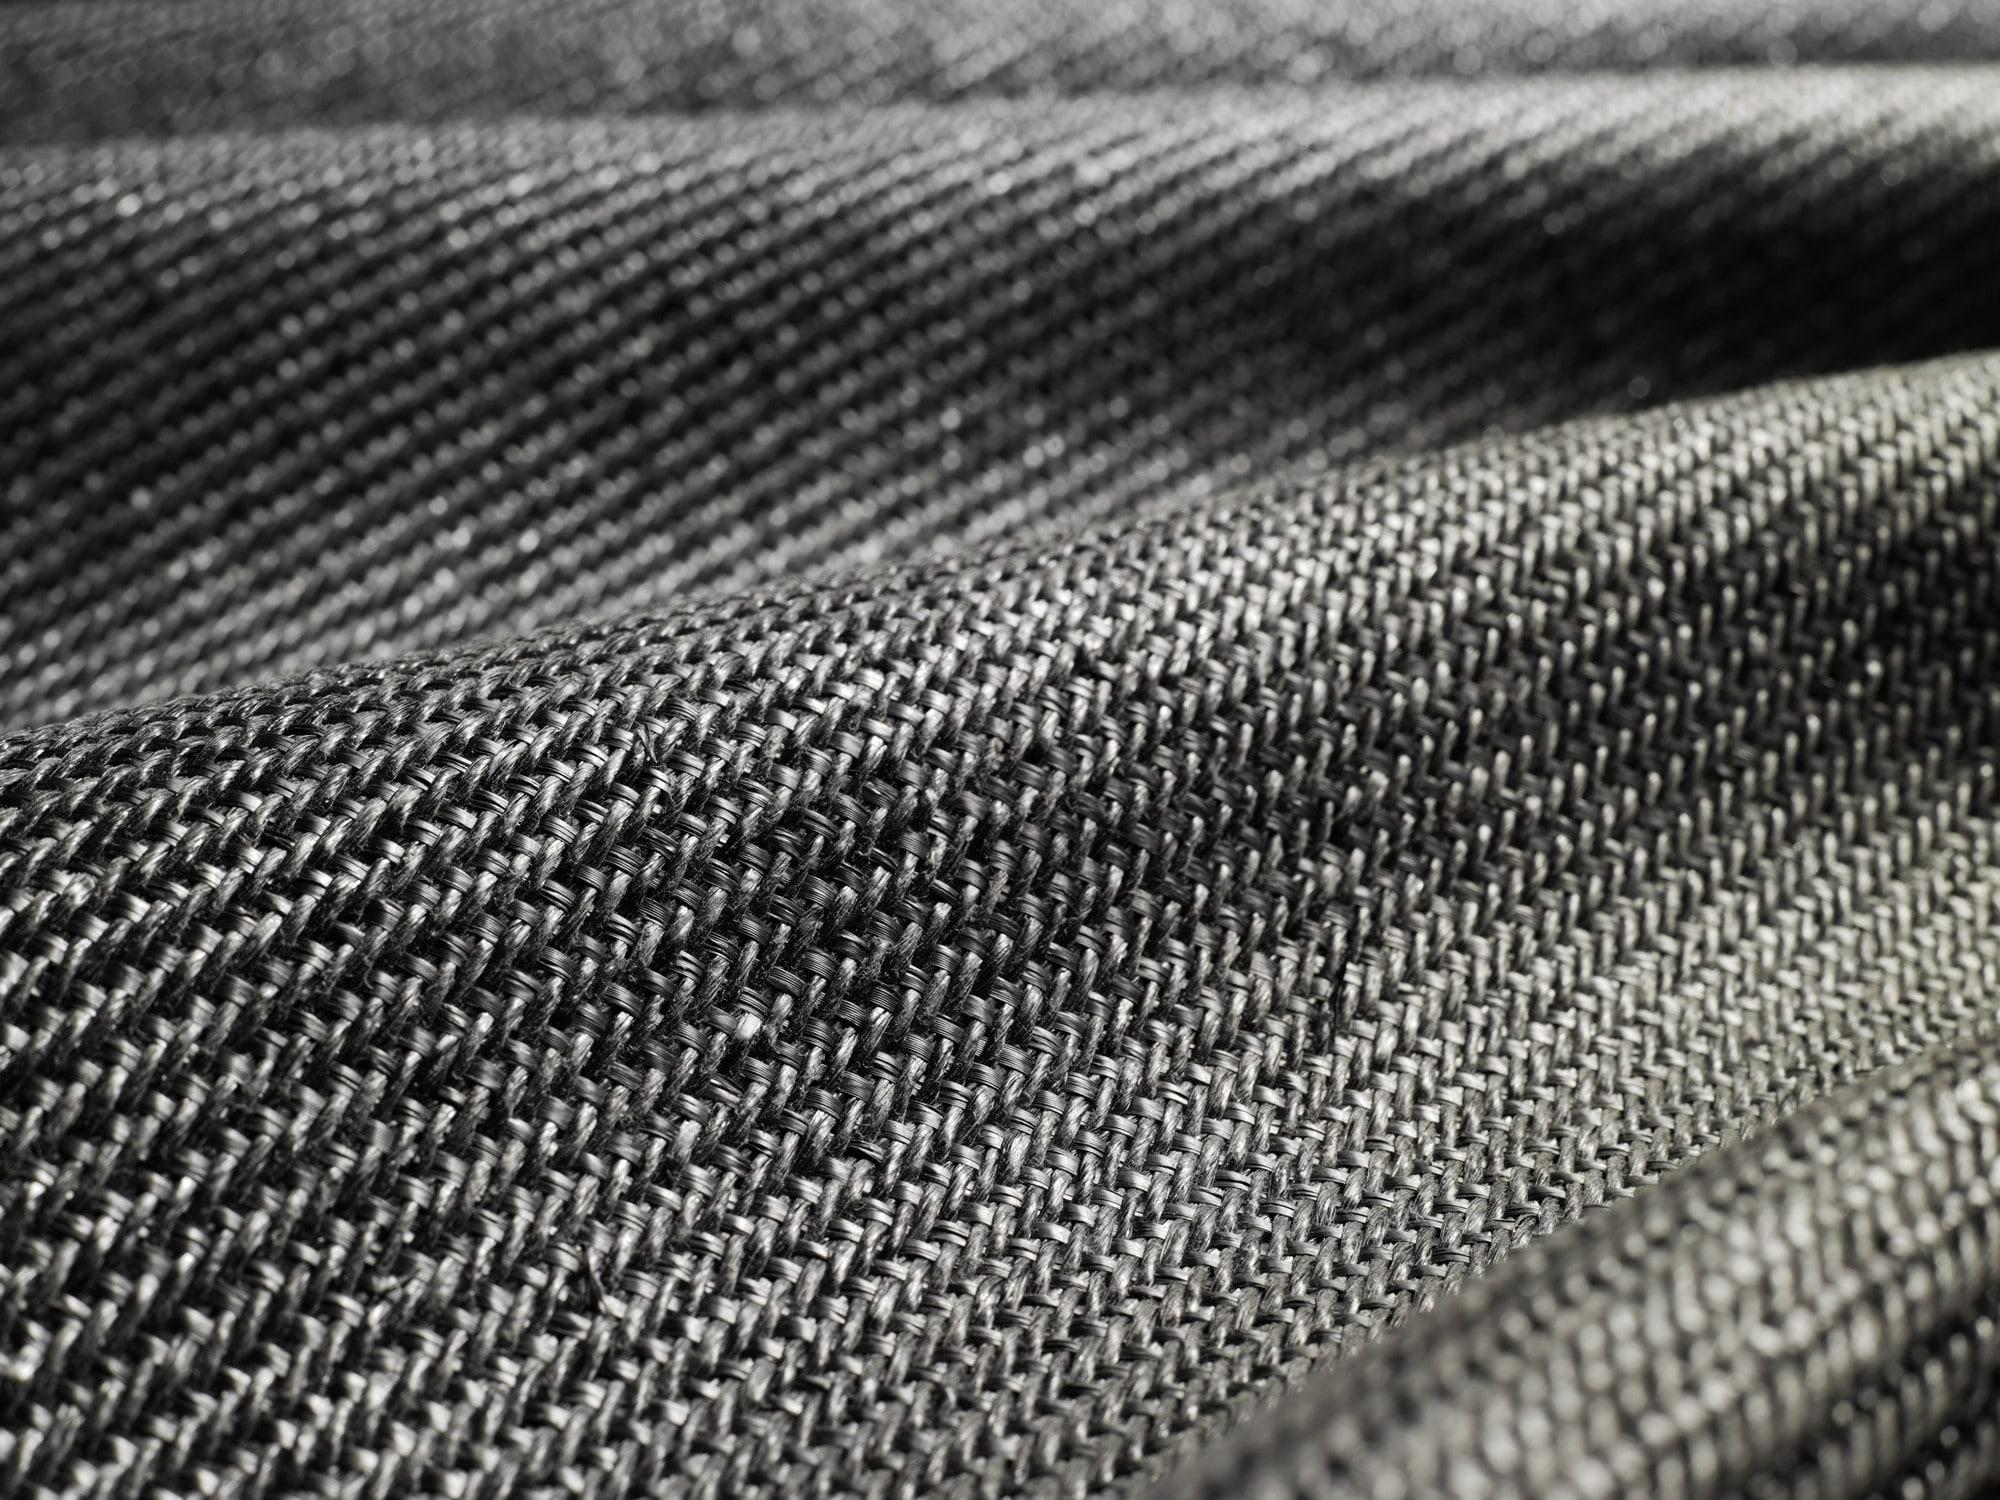 Geosynthetics Materials - TenCate Geolon PP